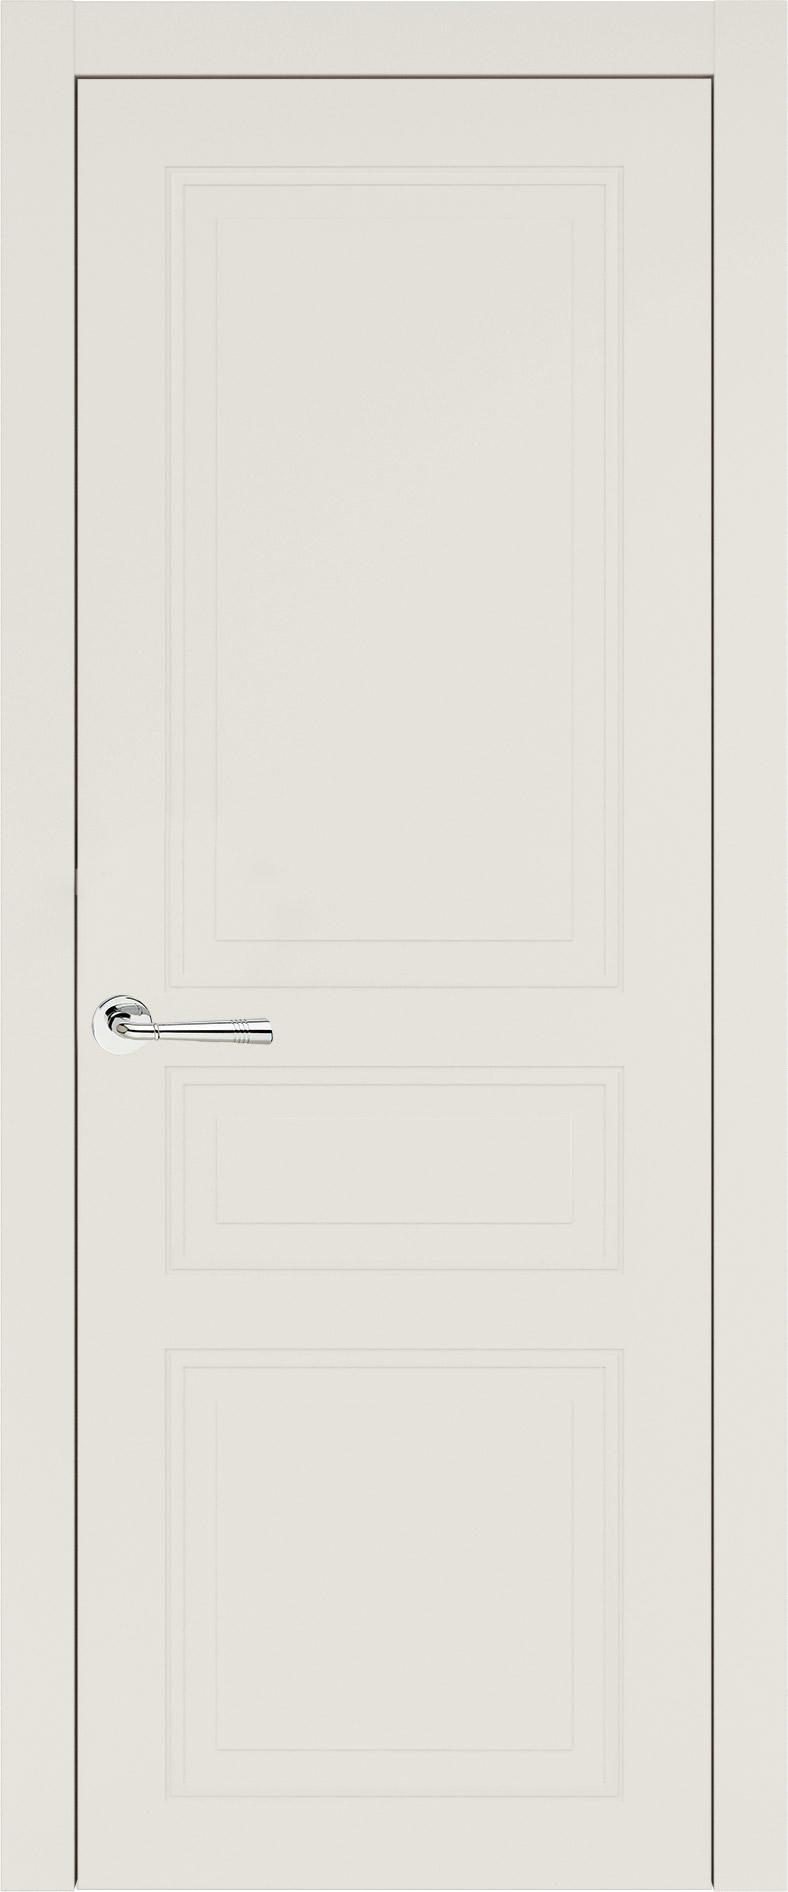 Imperia-R Neo Classic цвет - Бежевая эмаль (RAL 9010) Без стекла (ДГ)